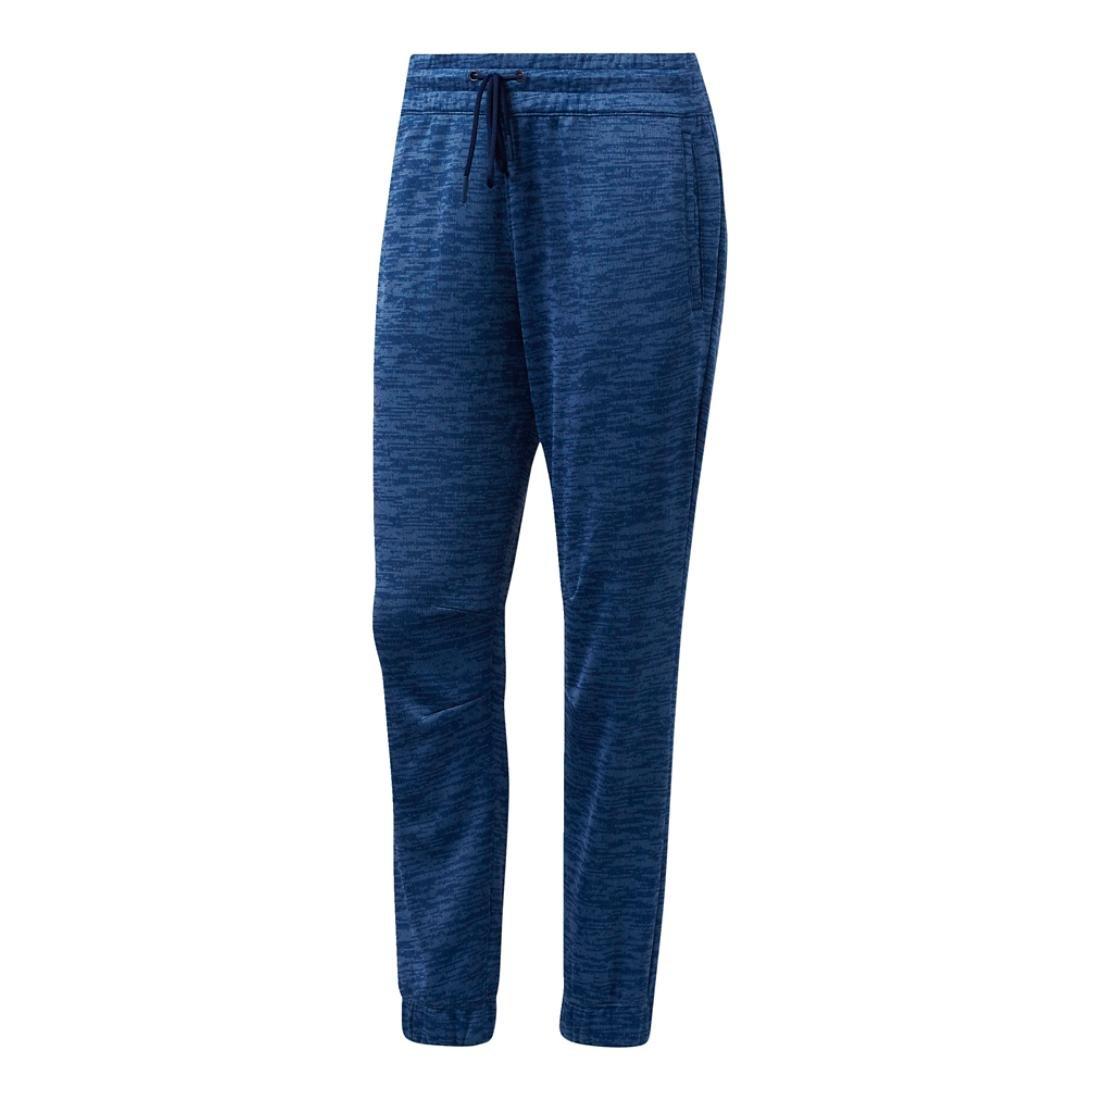 Mystery bleu L adidas pour Femme 2 Rue 7 8 Pantalon